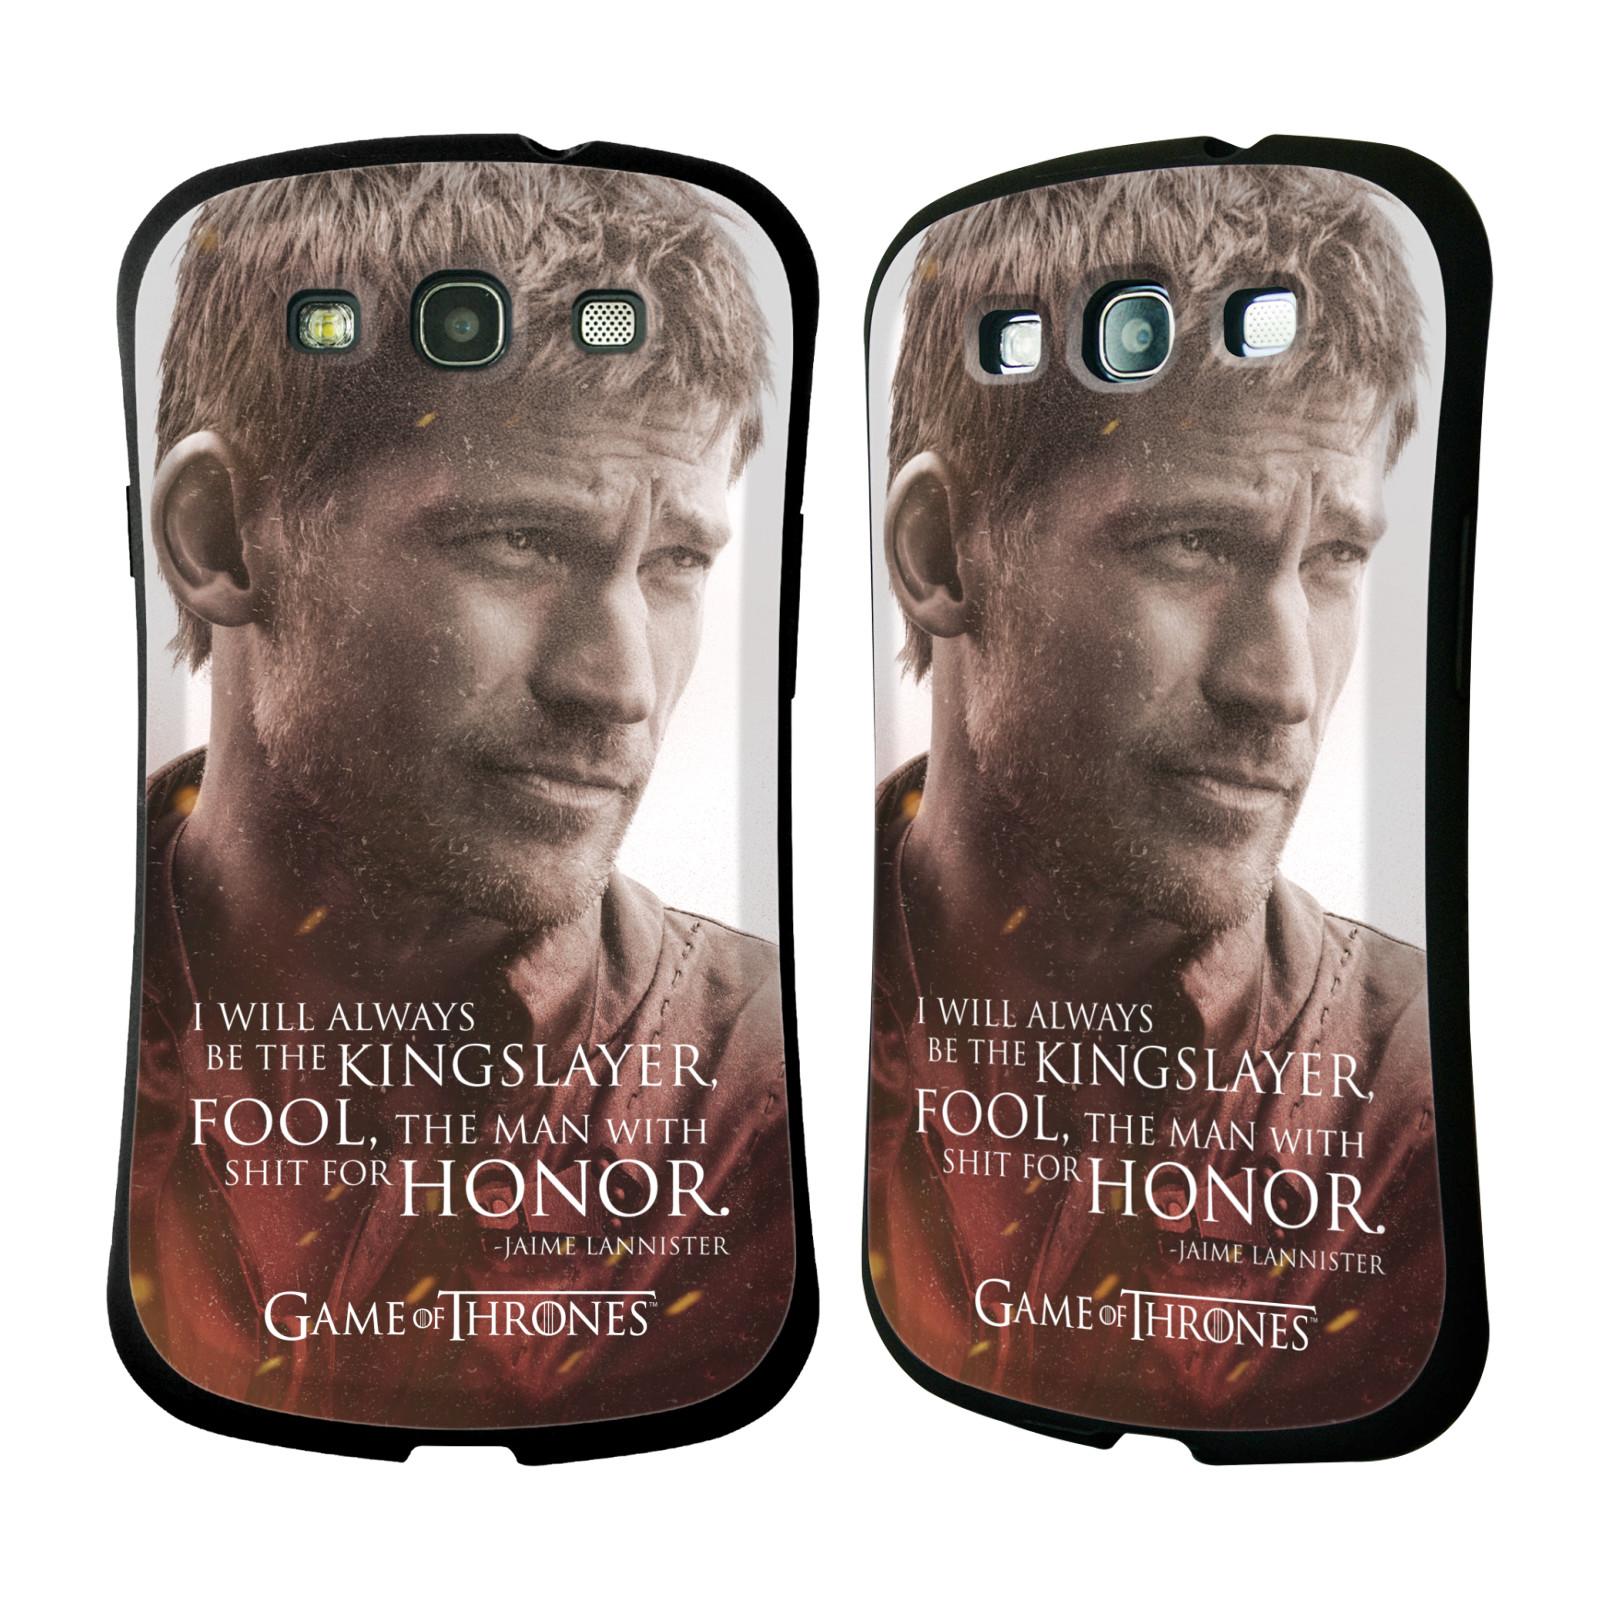 HEAD CASE silikon/plast odolný obal na mobil Samsung Galaxy S3 i9300 / S3 NEO Hra o trůny postava Jaime Lannister králokat